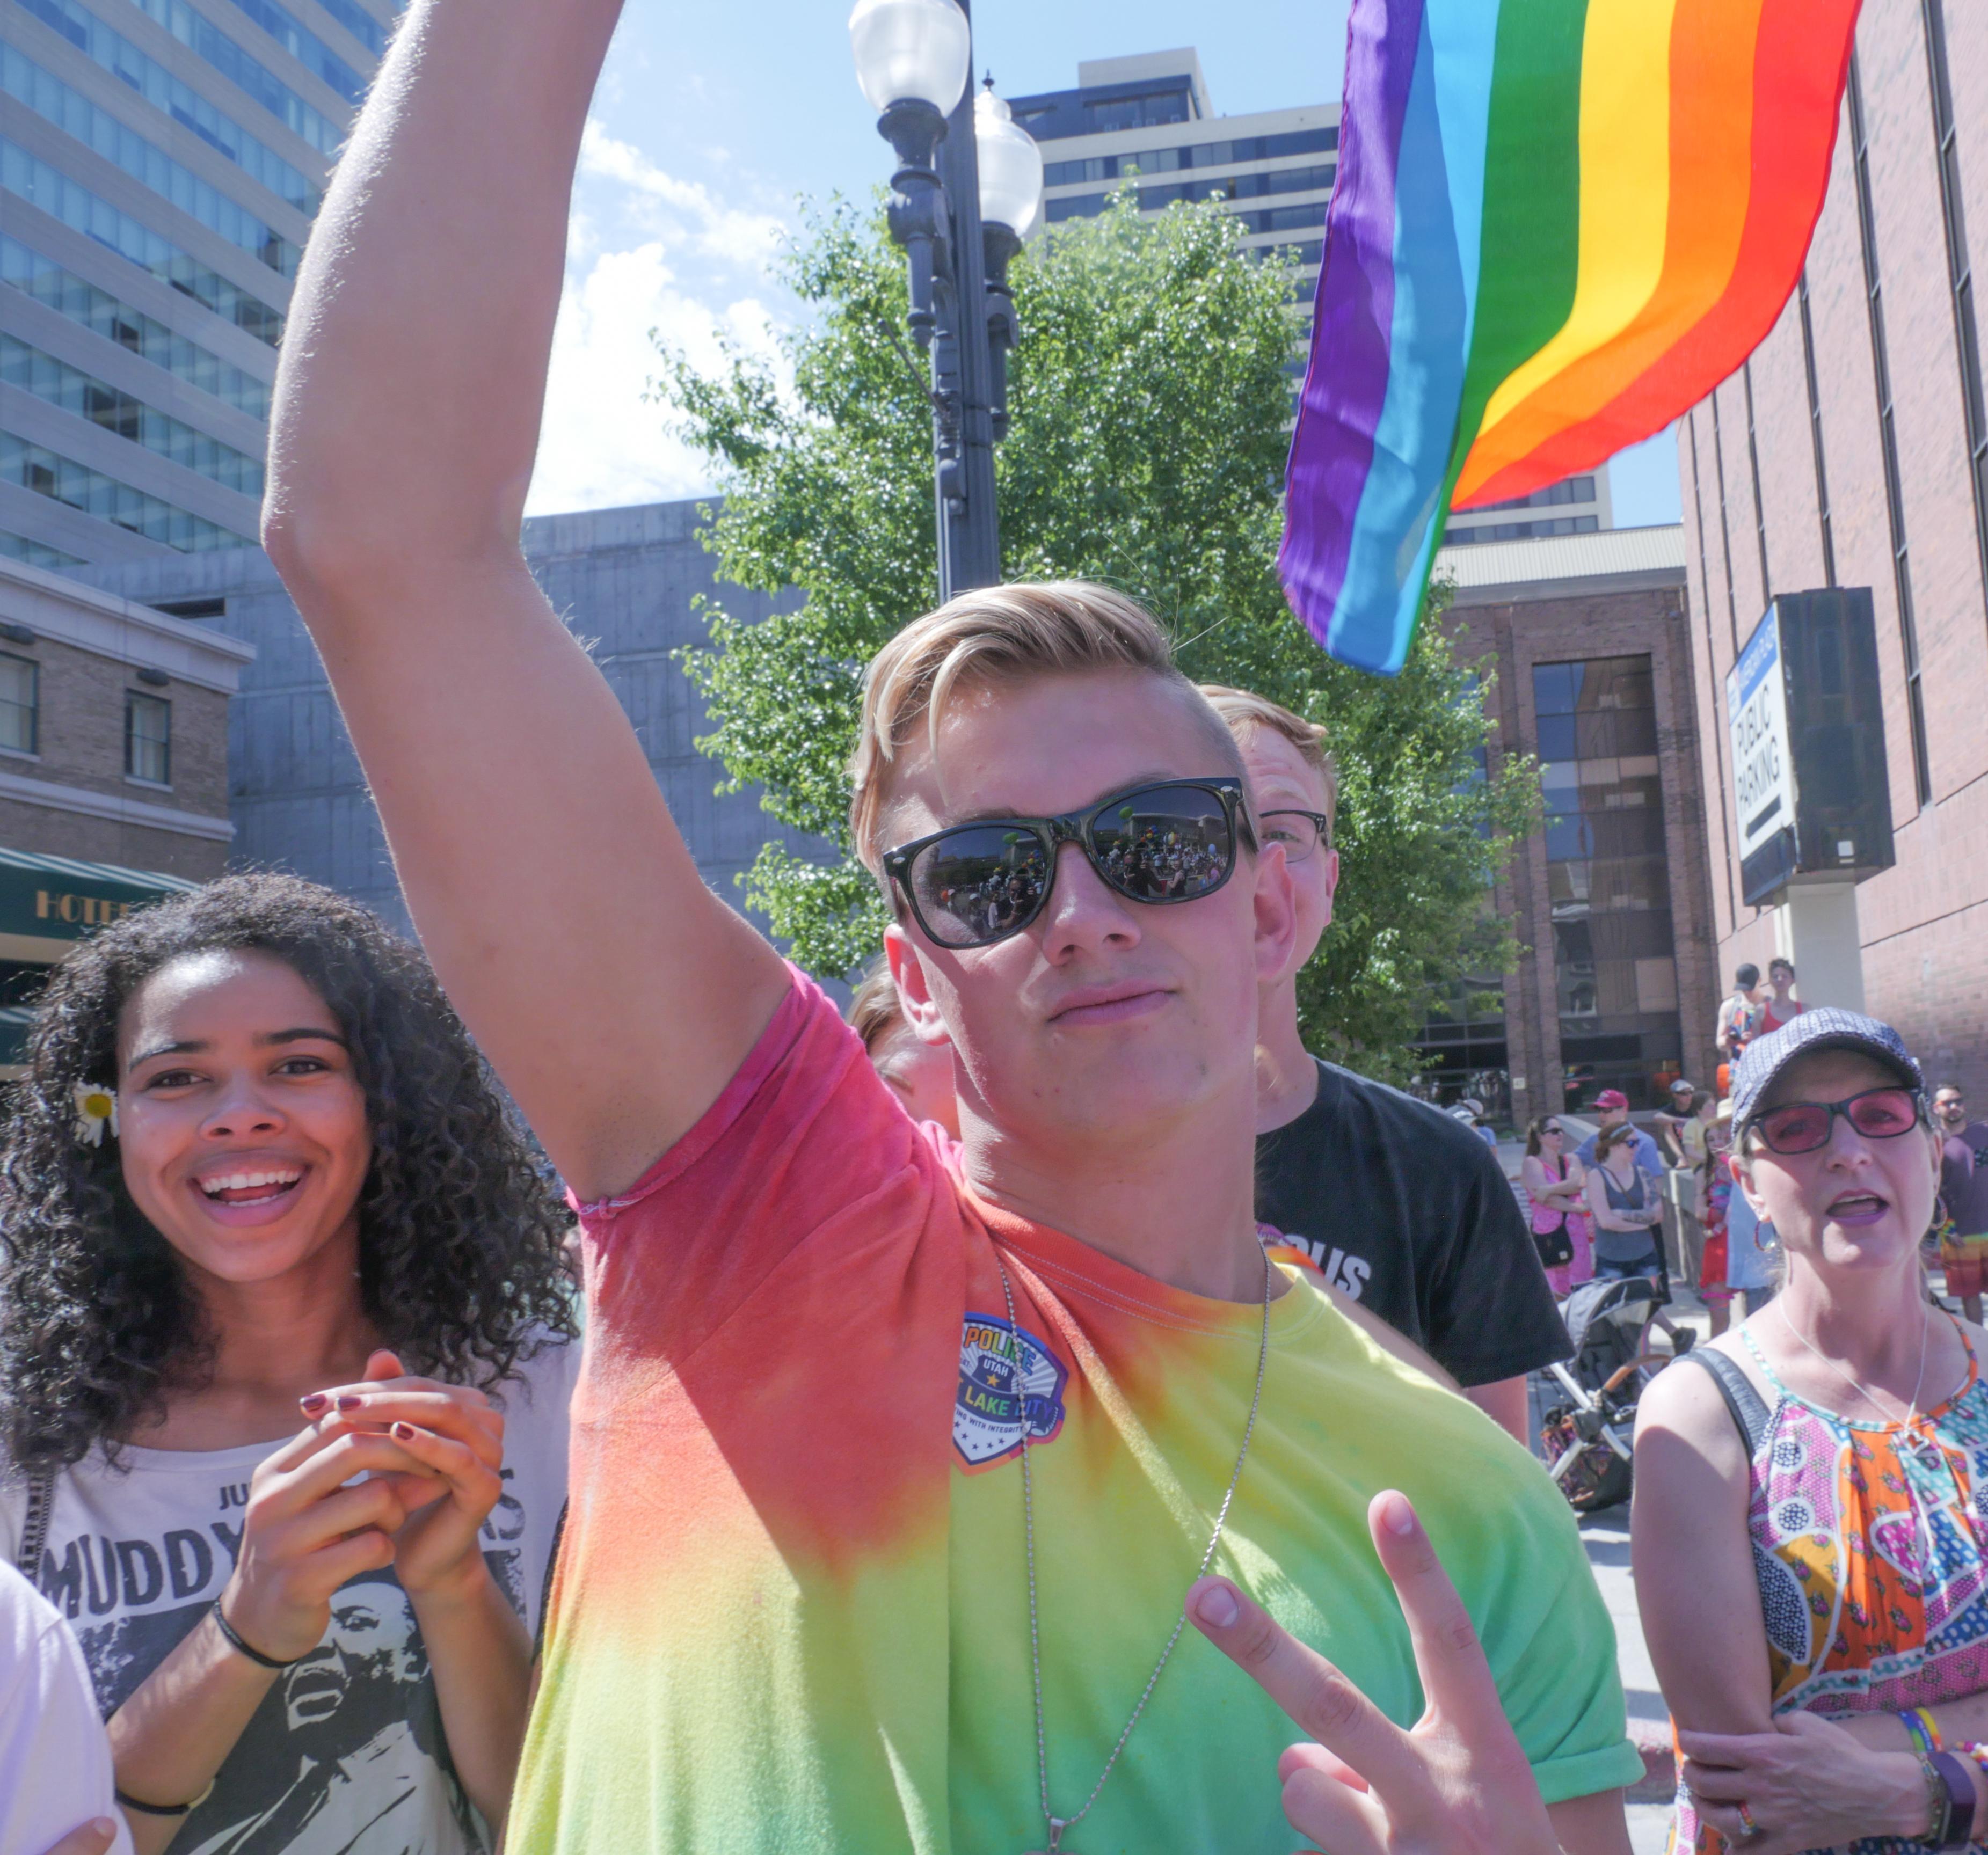 Video, photo gallery: See the 2017 Utah Pride Parade ...